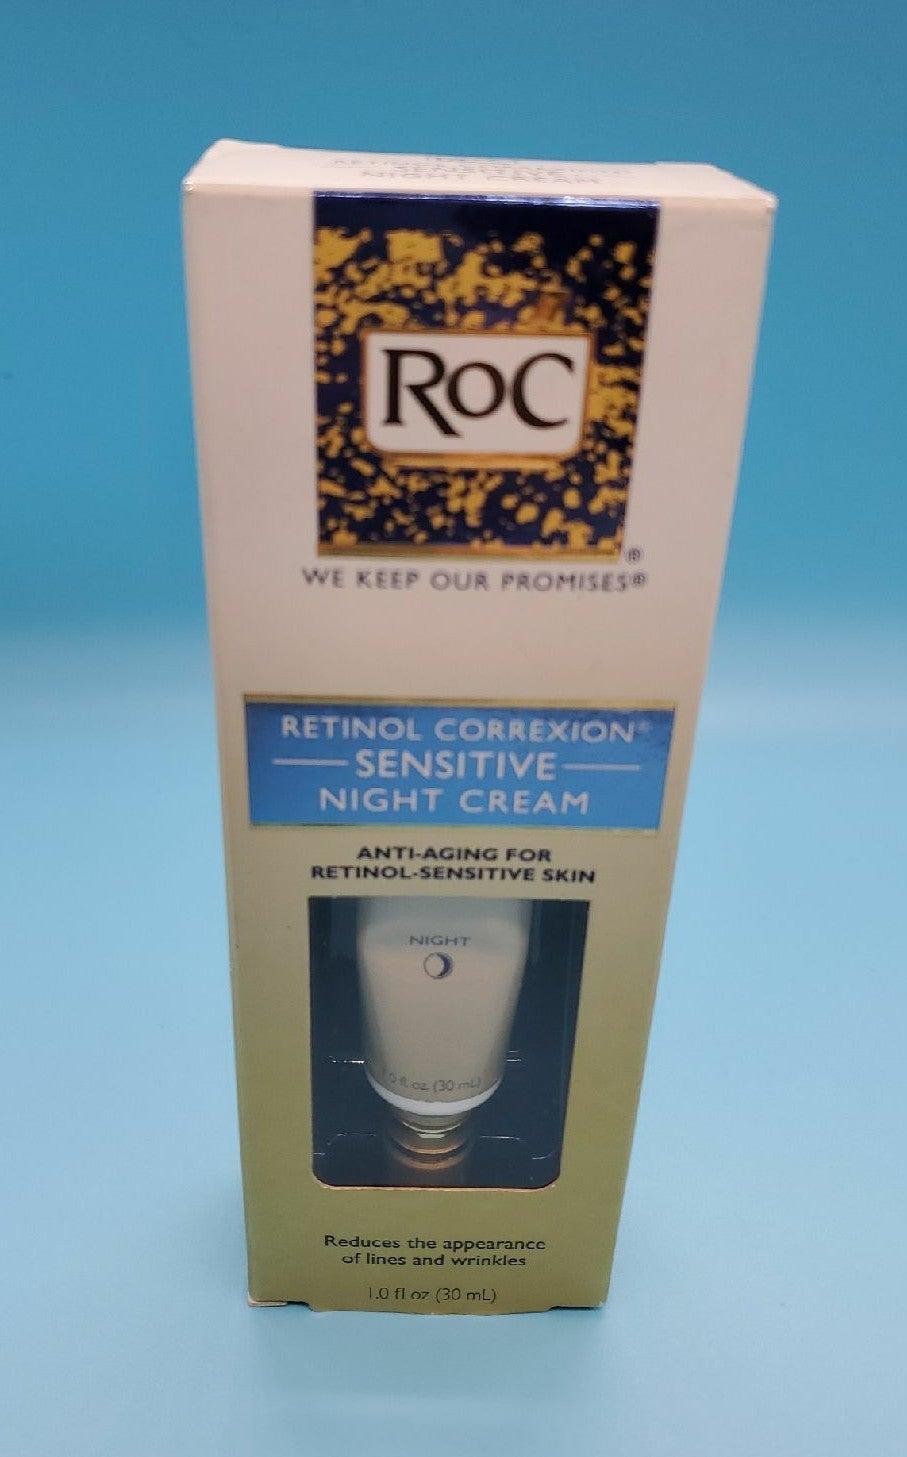 RoC Retinol Correxion Sensitive Night Cr